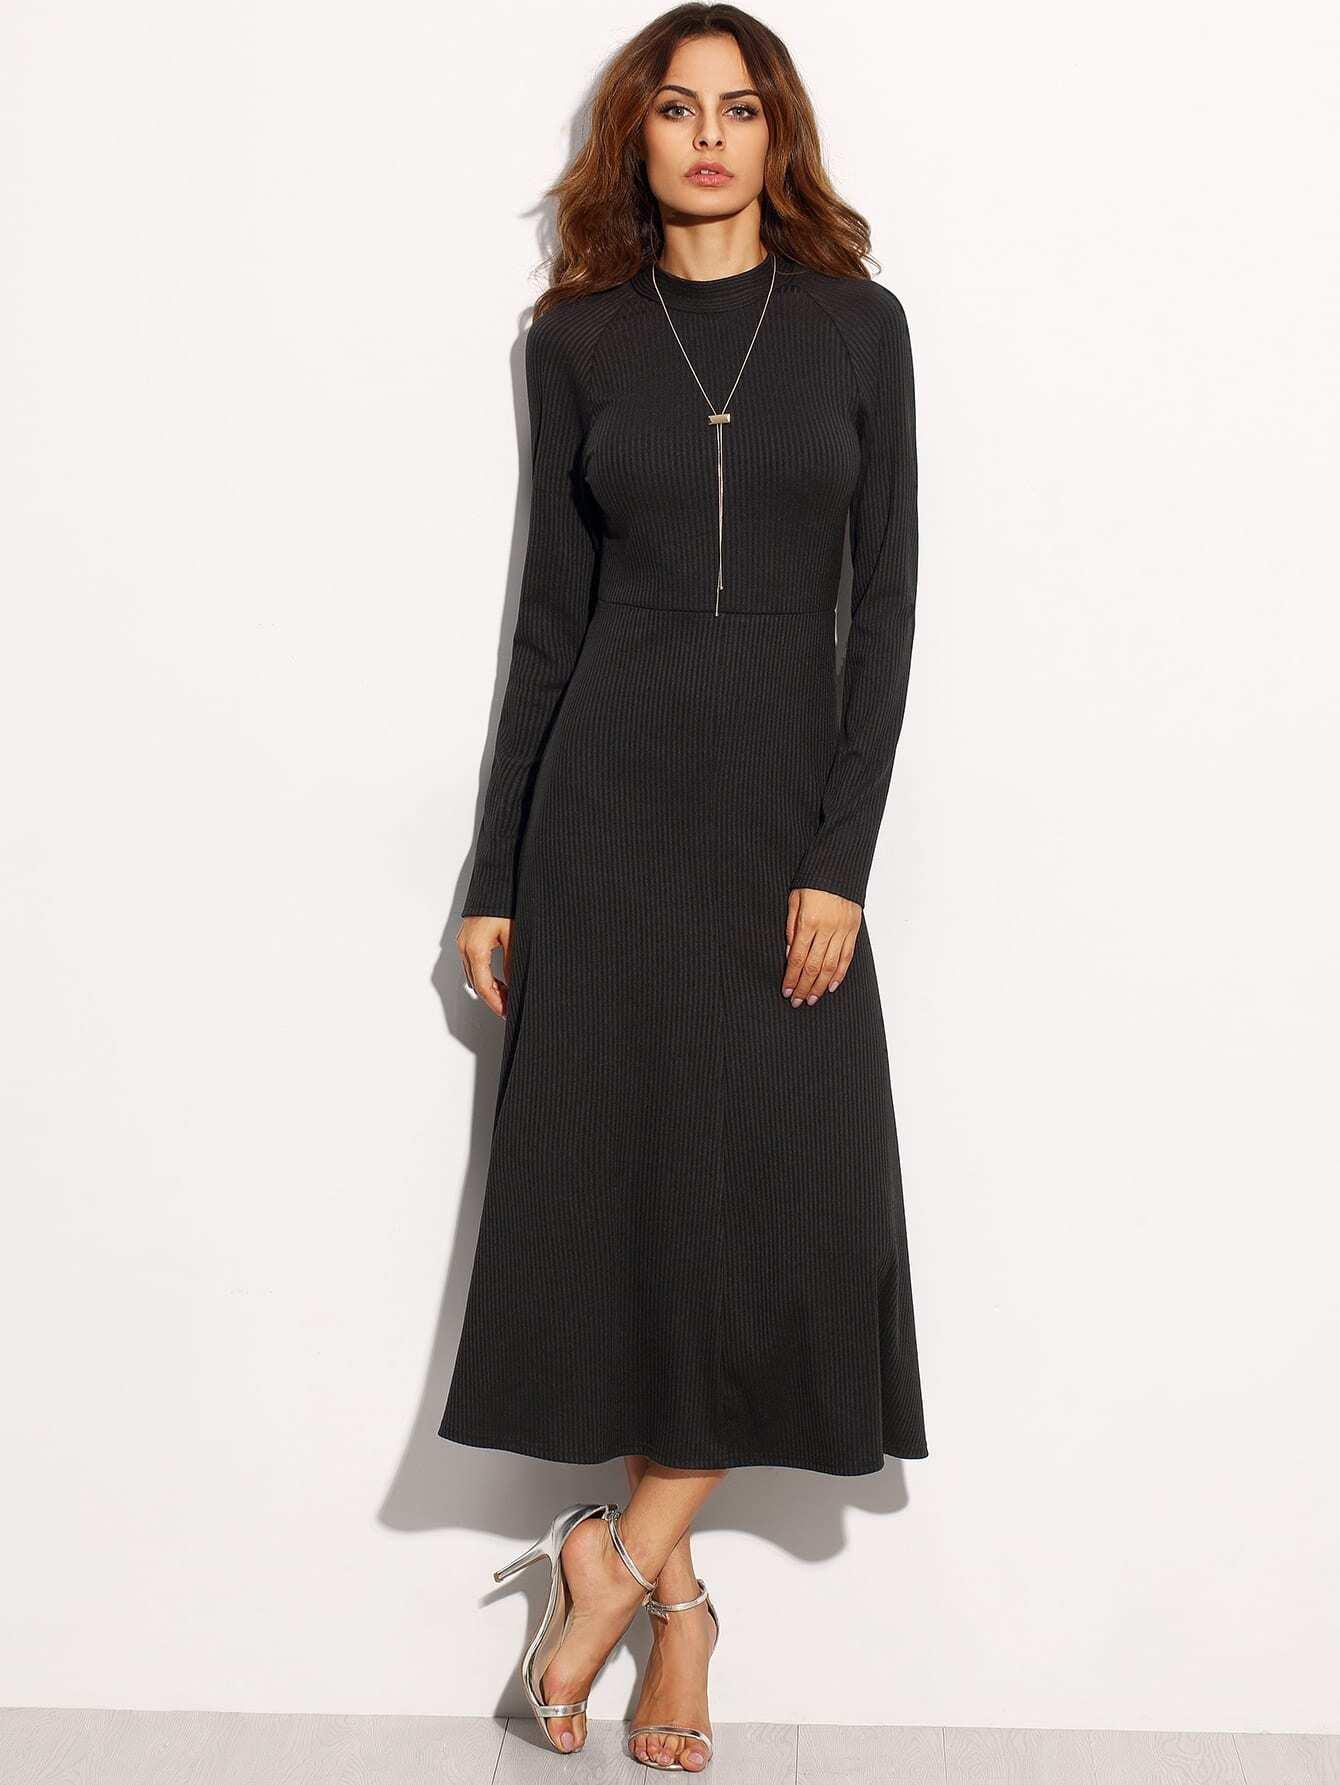 Black Tie Cut Out Back Long Sleeve Dress